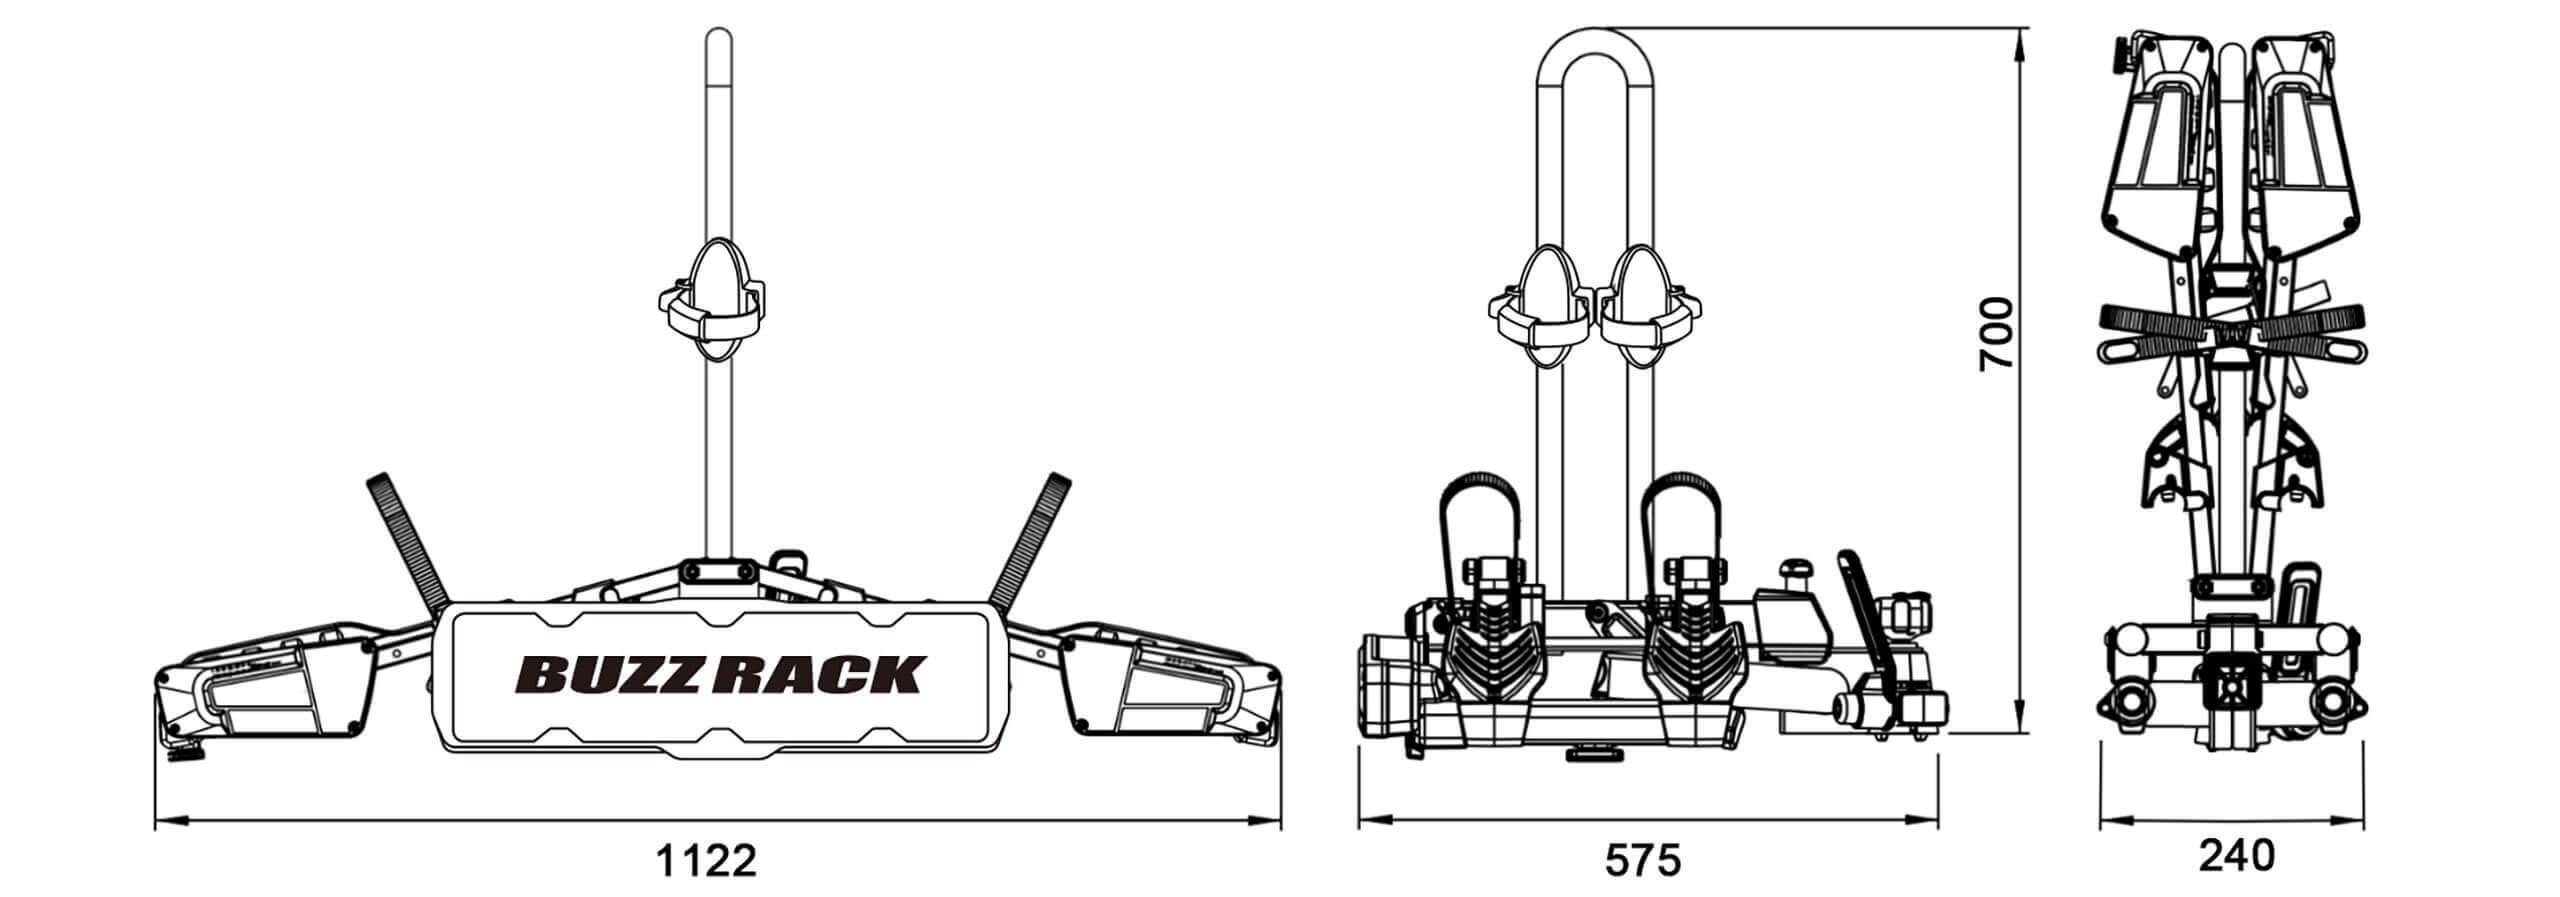 Buzz Rack Eazzy 2 Bike Folding And Tilting Rack No Brp722